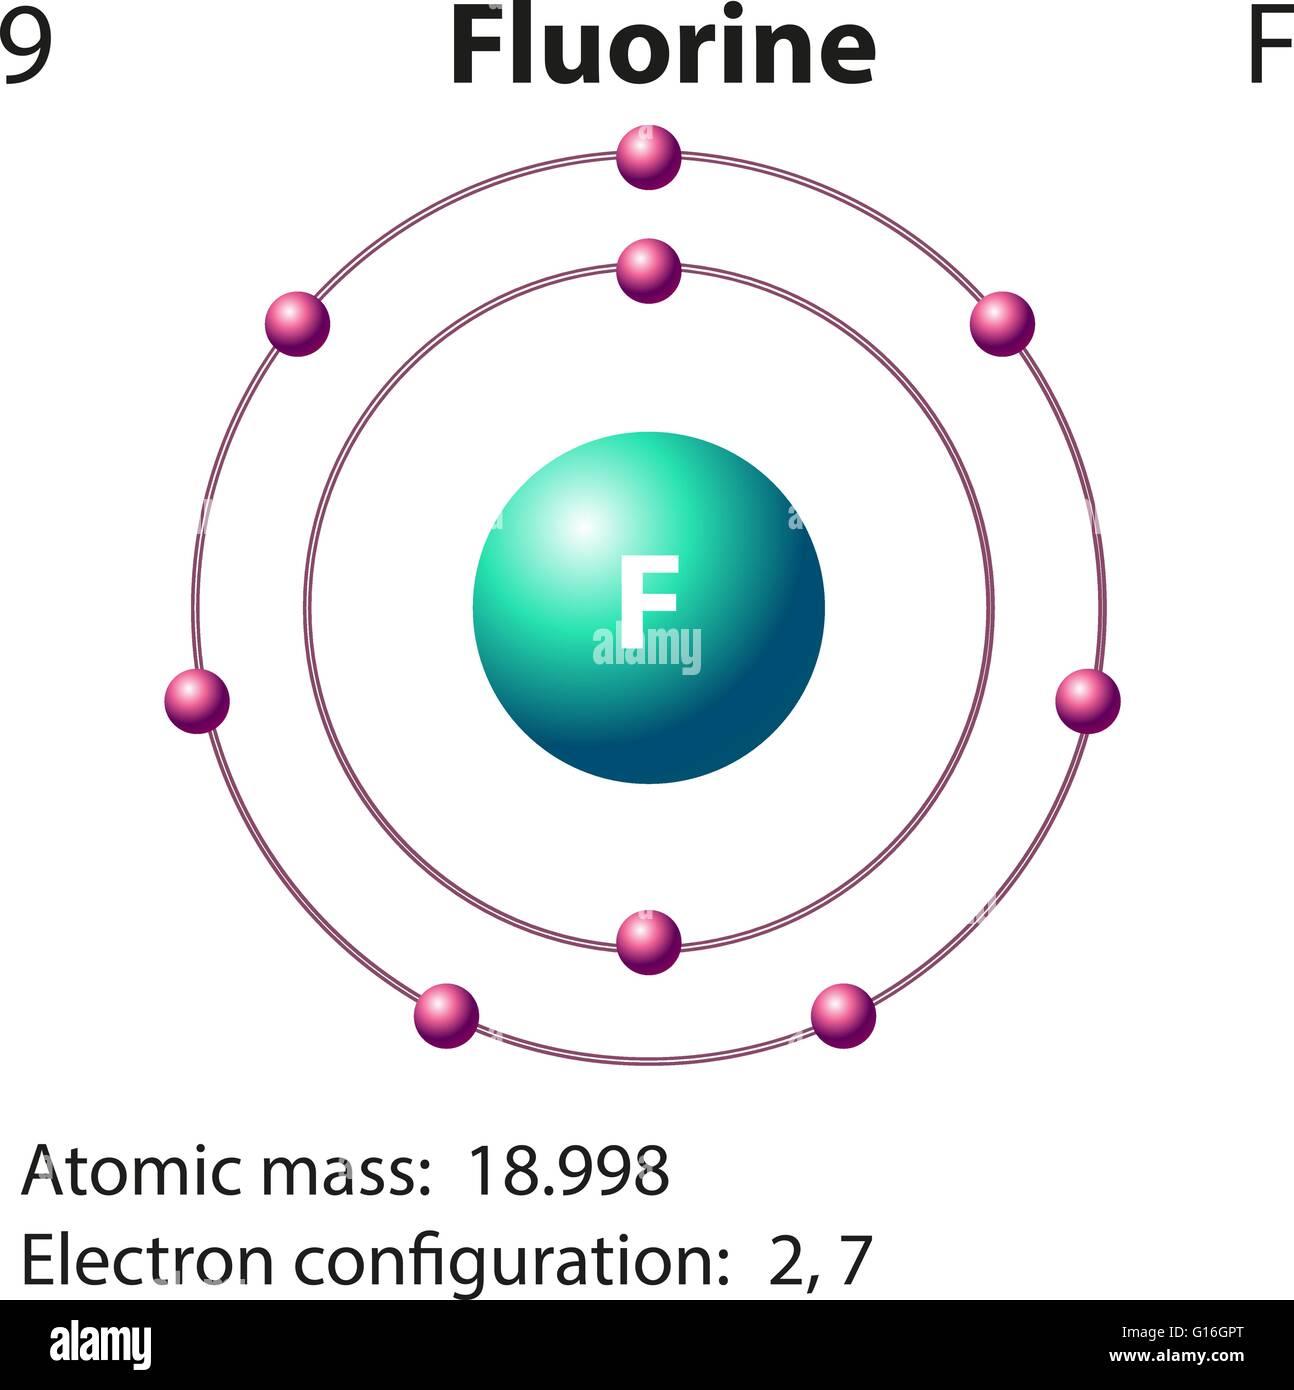 Diagram representation of the element fluorine illustration stock diagram representation of the element fluorine illustration pooptronica